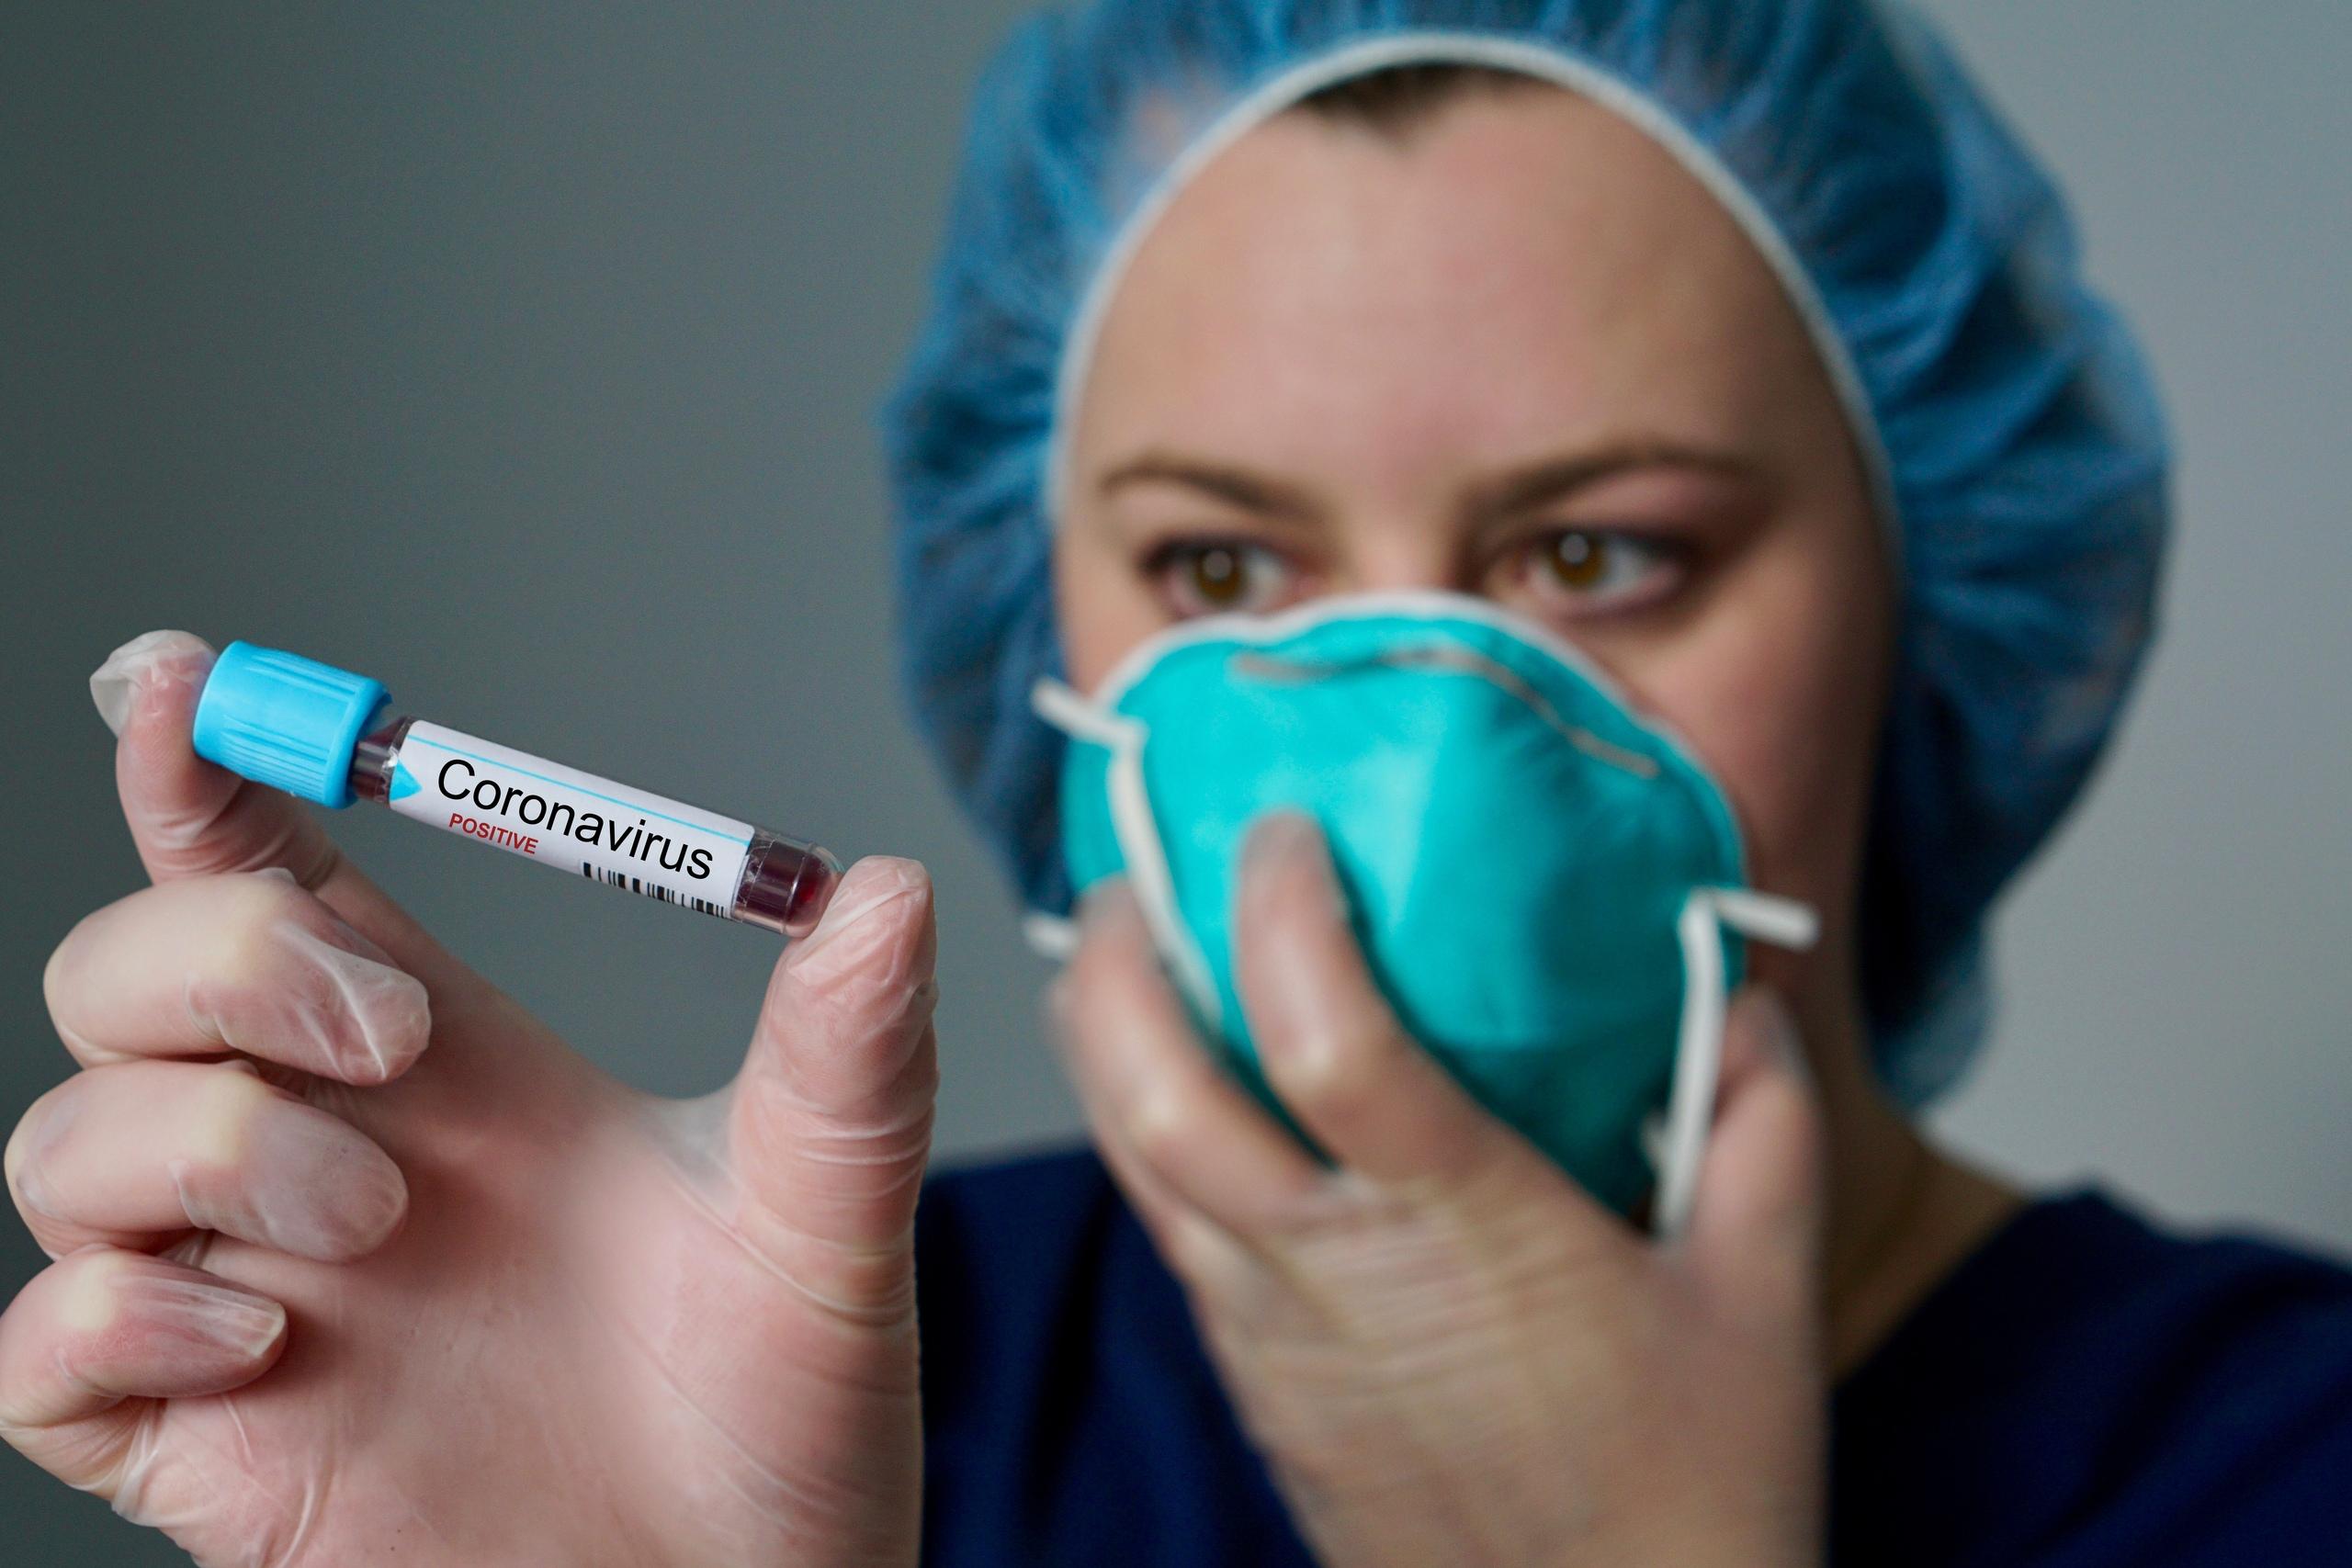 Описан фермент, который позволяет коронавирусу сопротивляться противовирусным препаратам